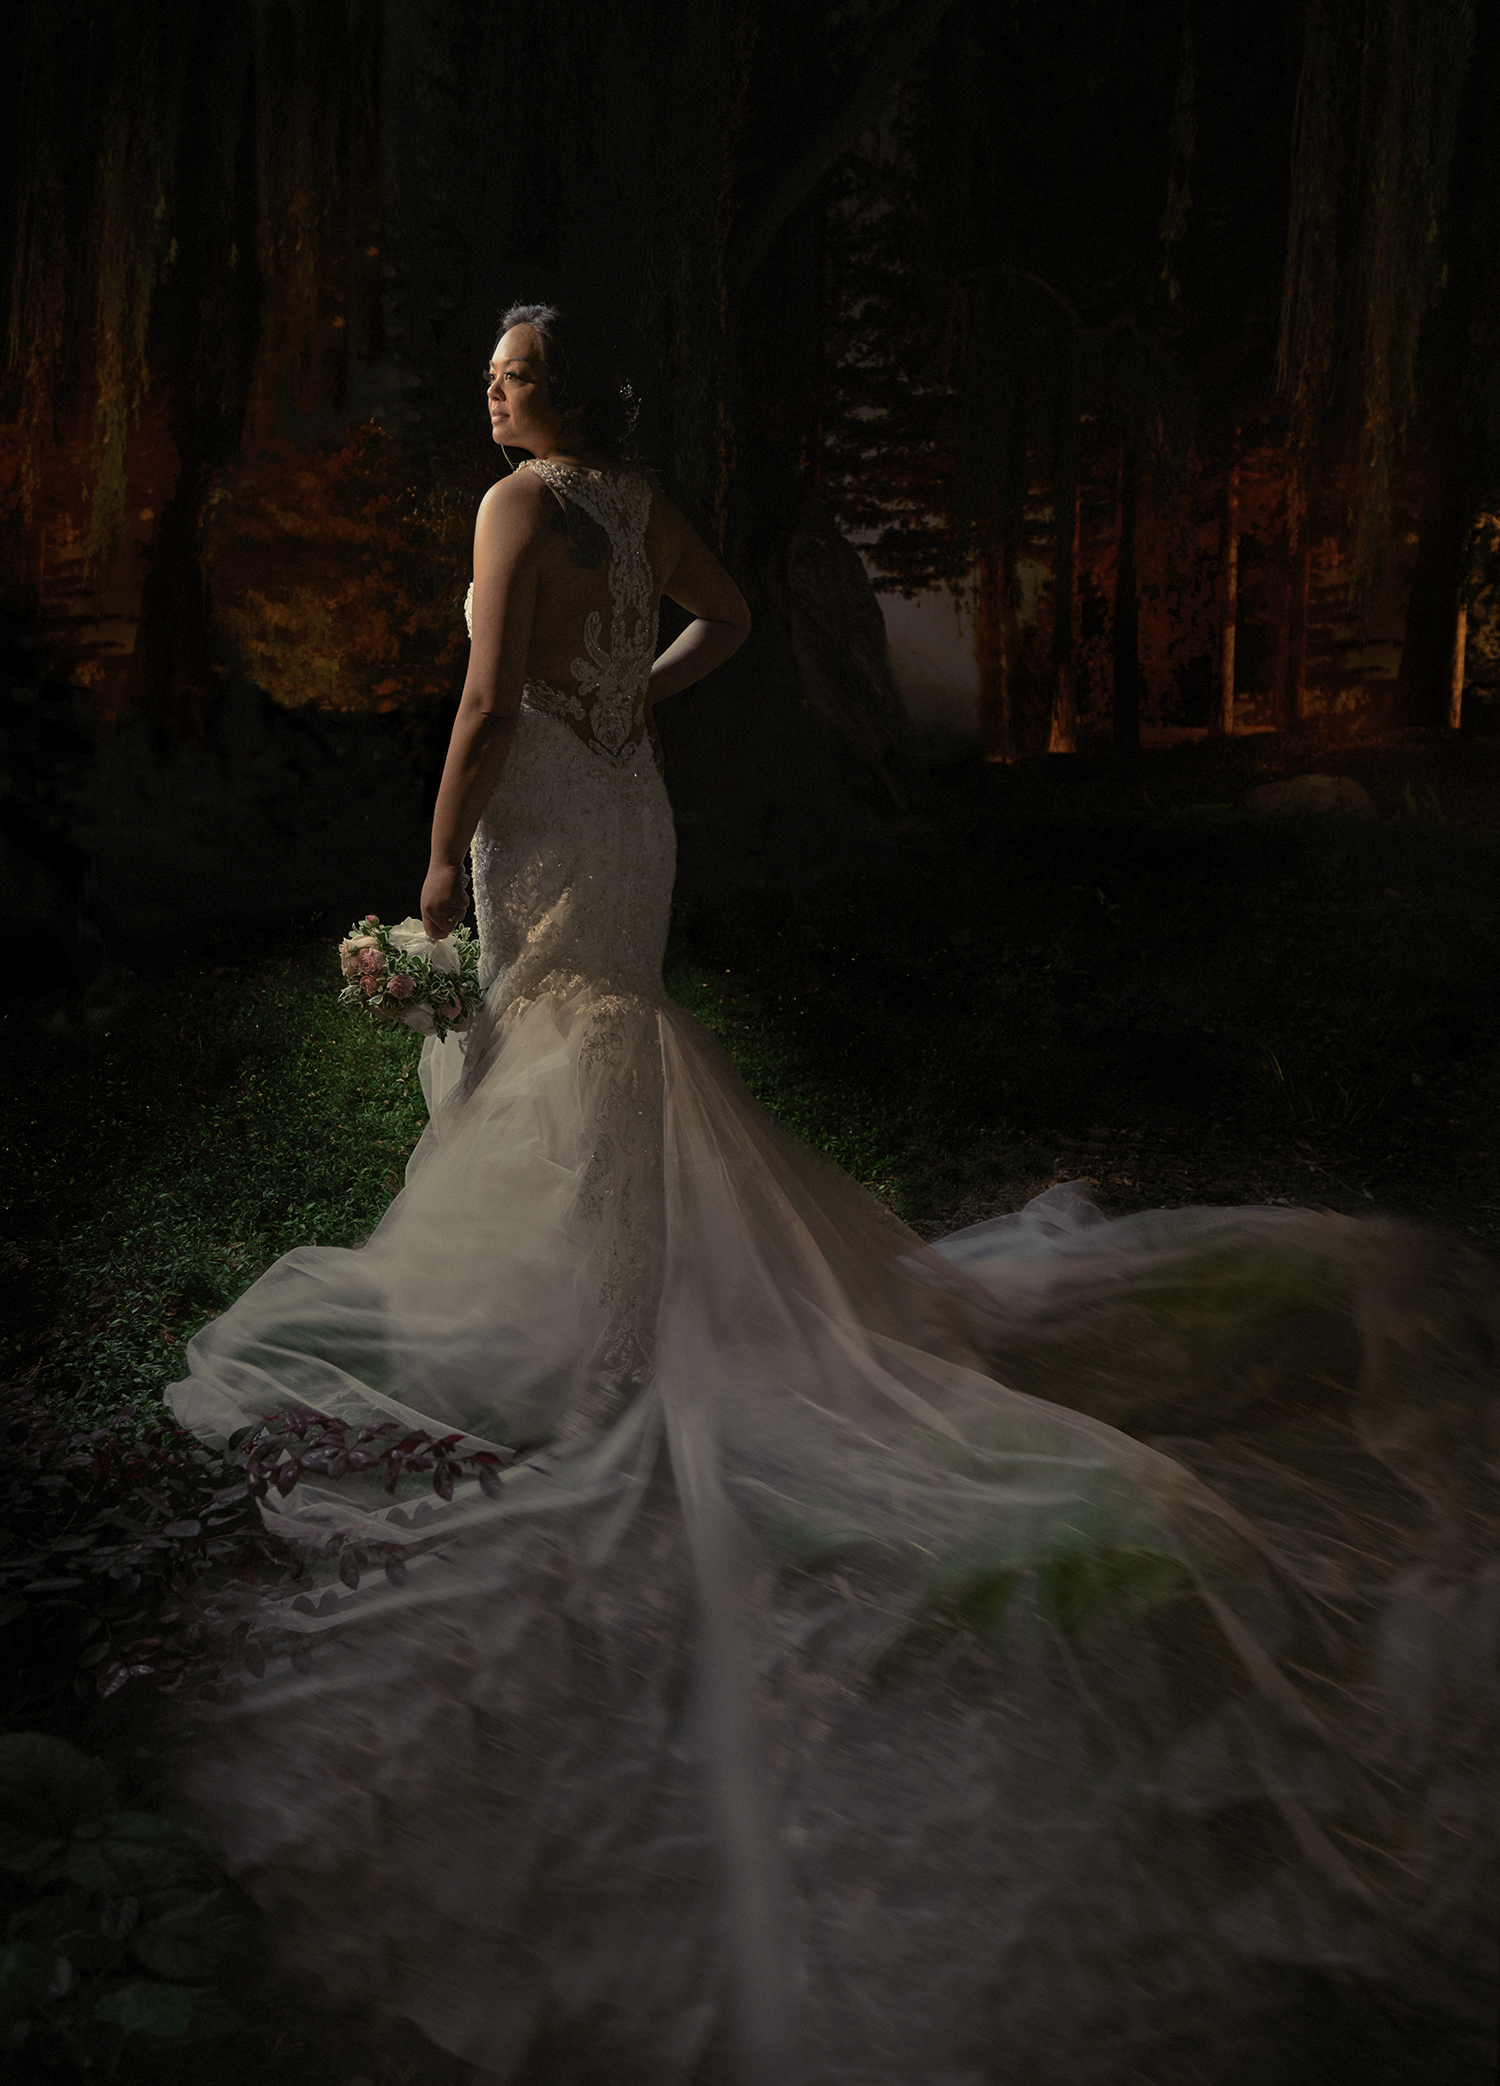 Luxchromatic_Wedding_Photographer__Bride_Best_Bay_Area_San_Francisco_San_Jose_Sony_Alpha_Profoto.png